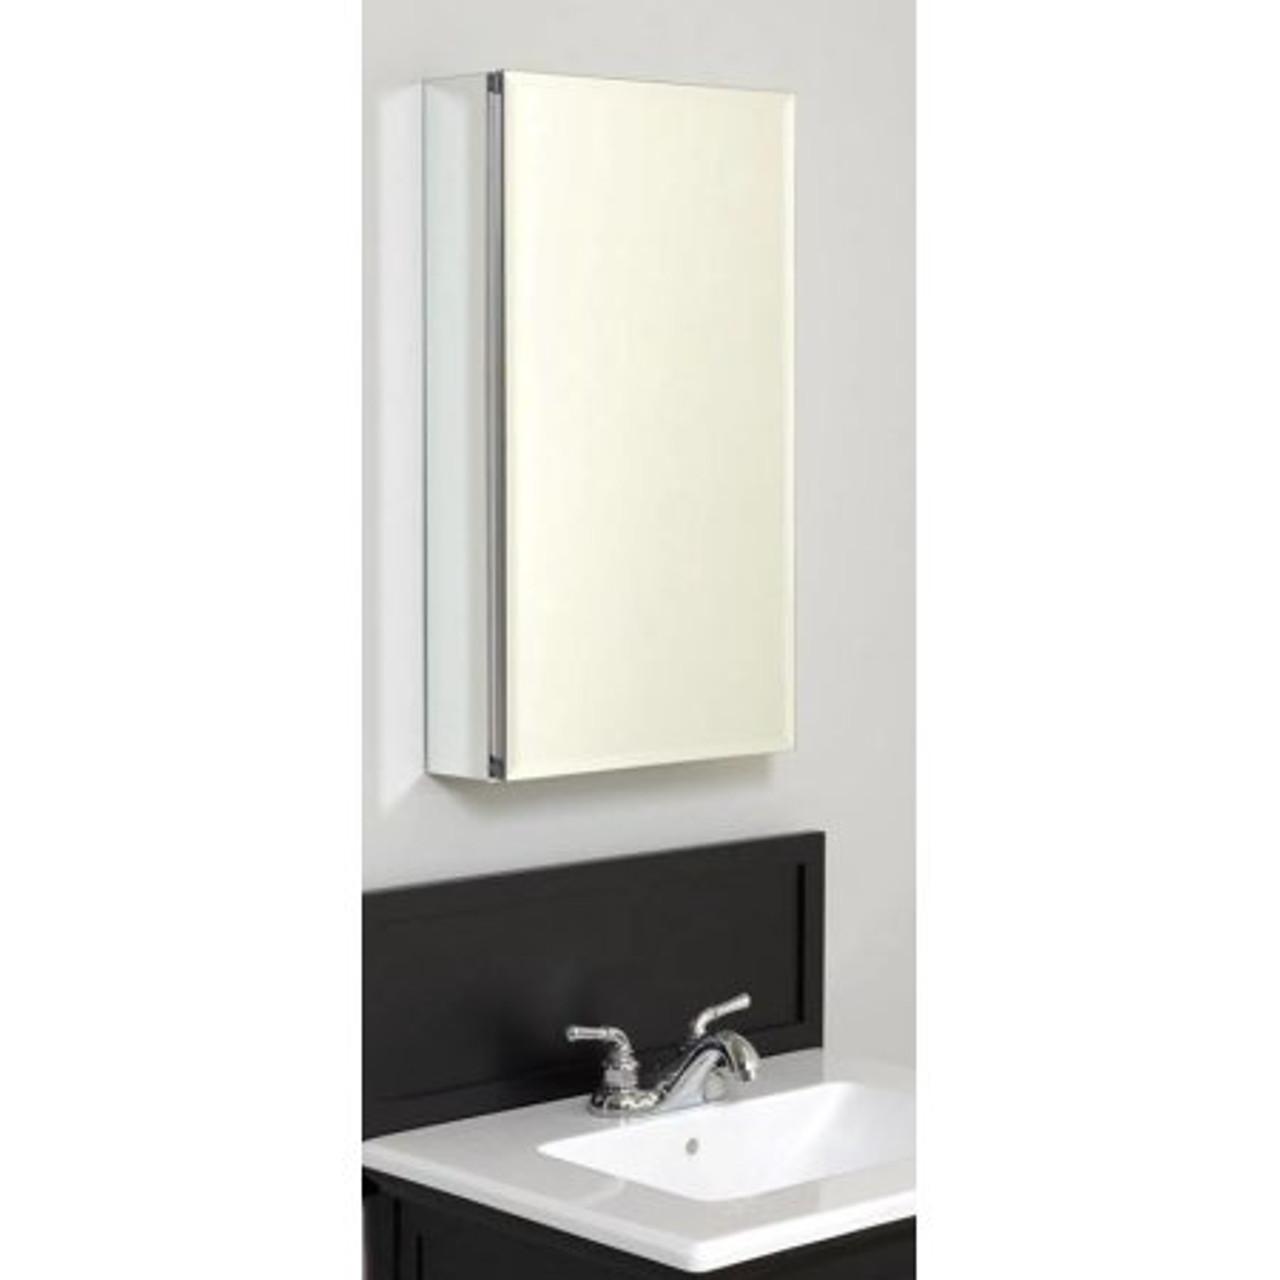 Picture of: Zenith Aluminum Beveled Mirror Medicine Cabinet 15 York Taps